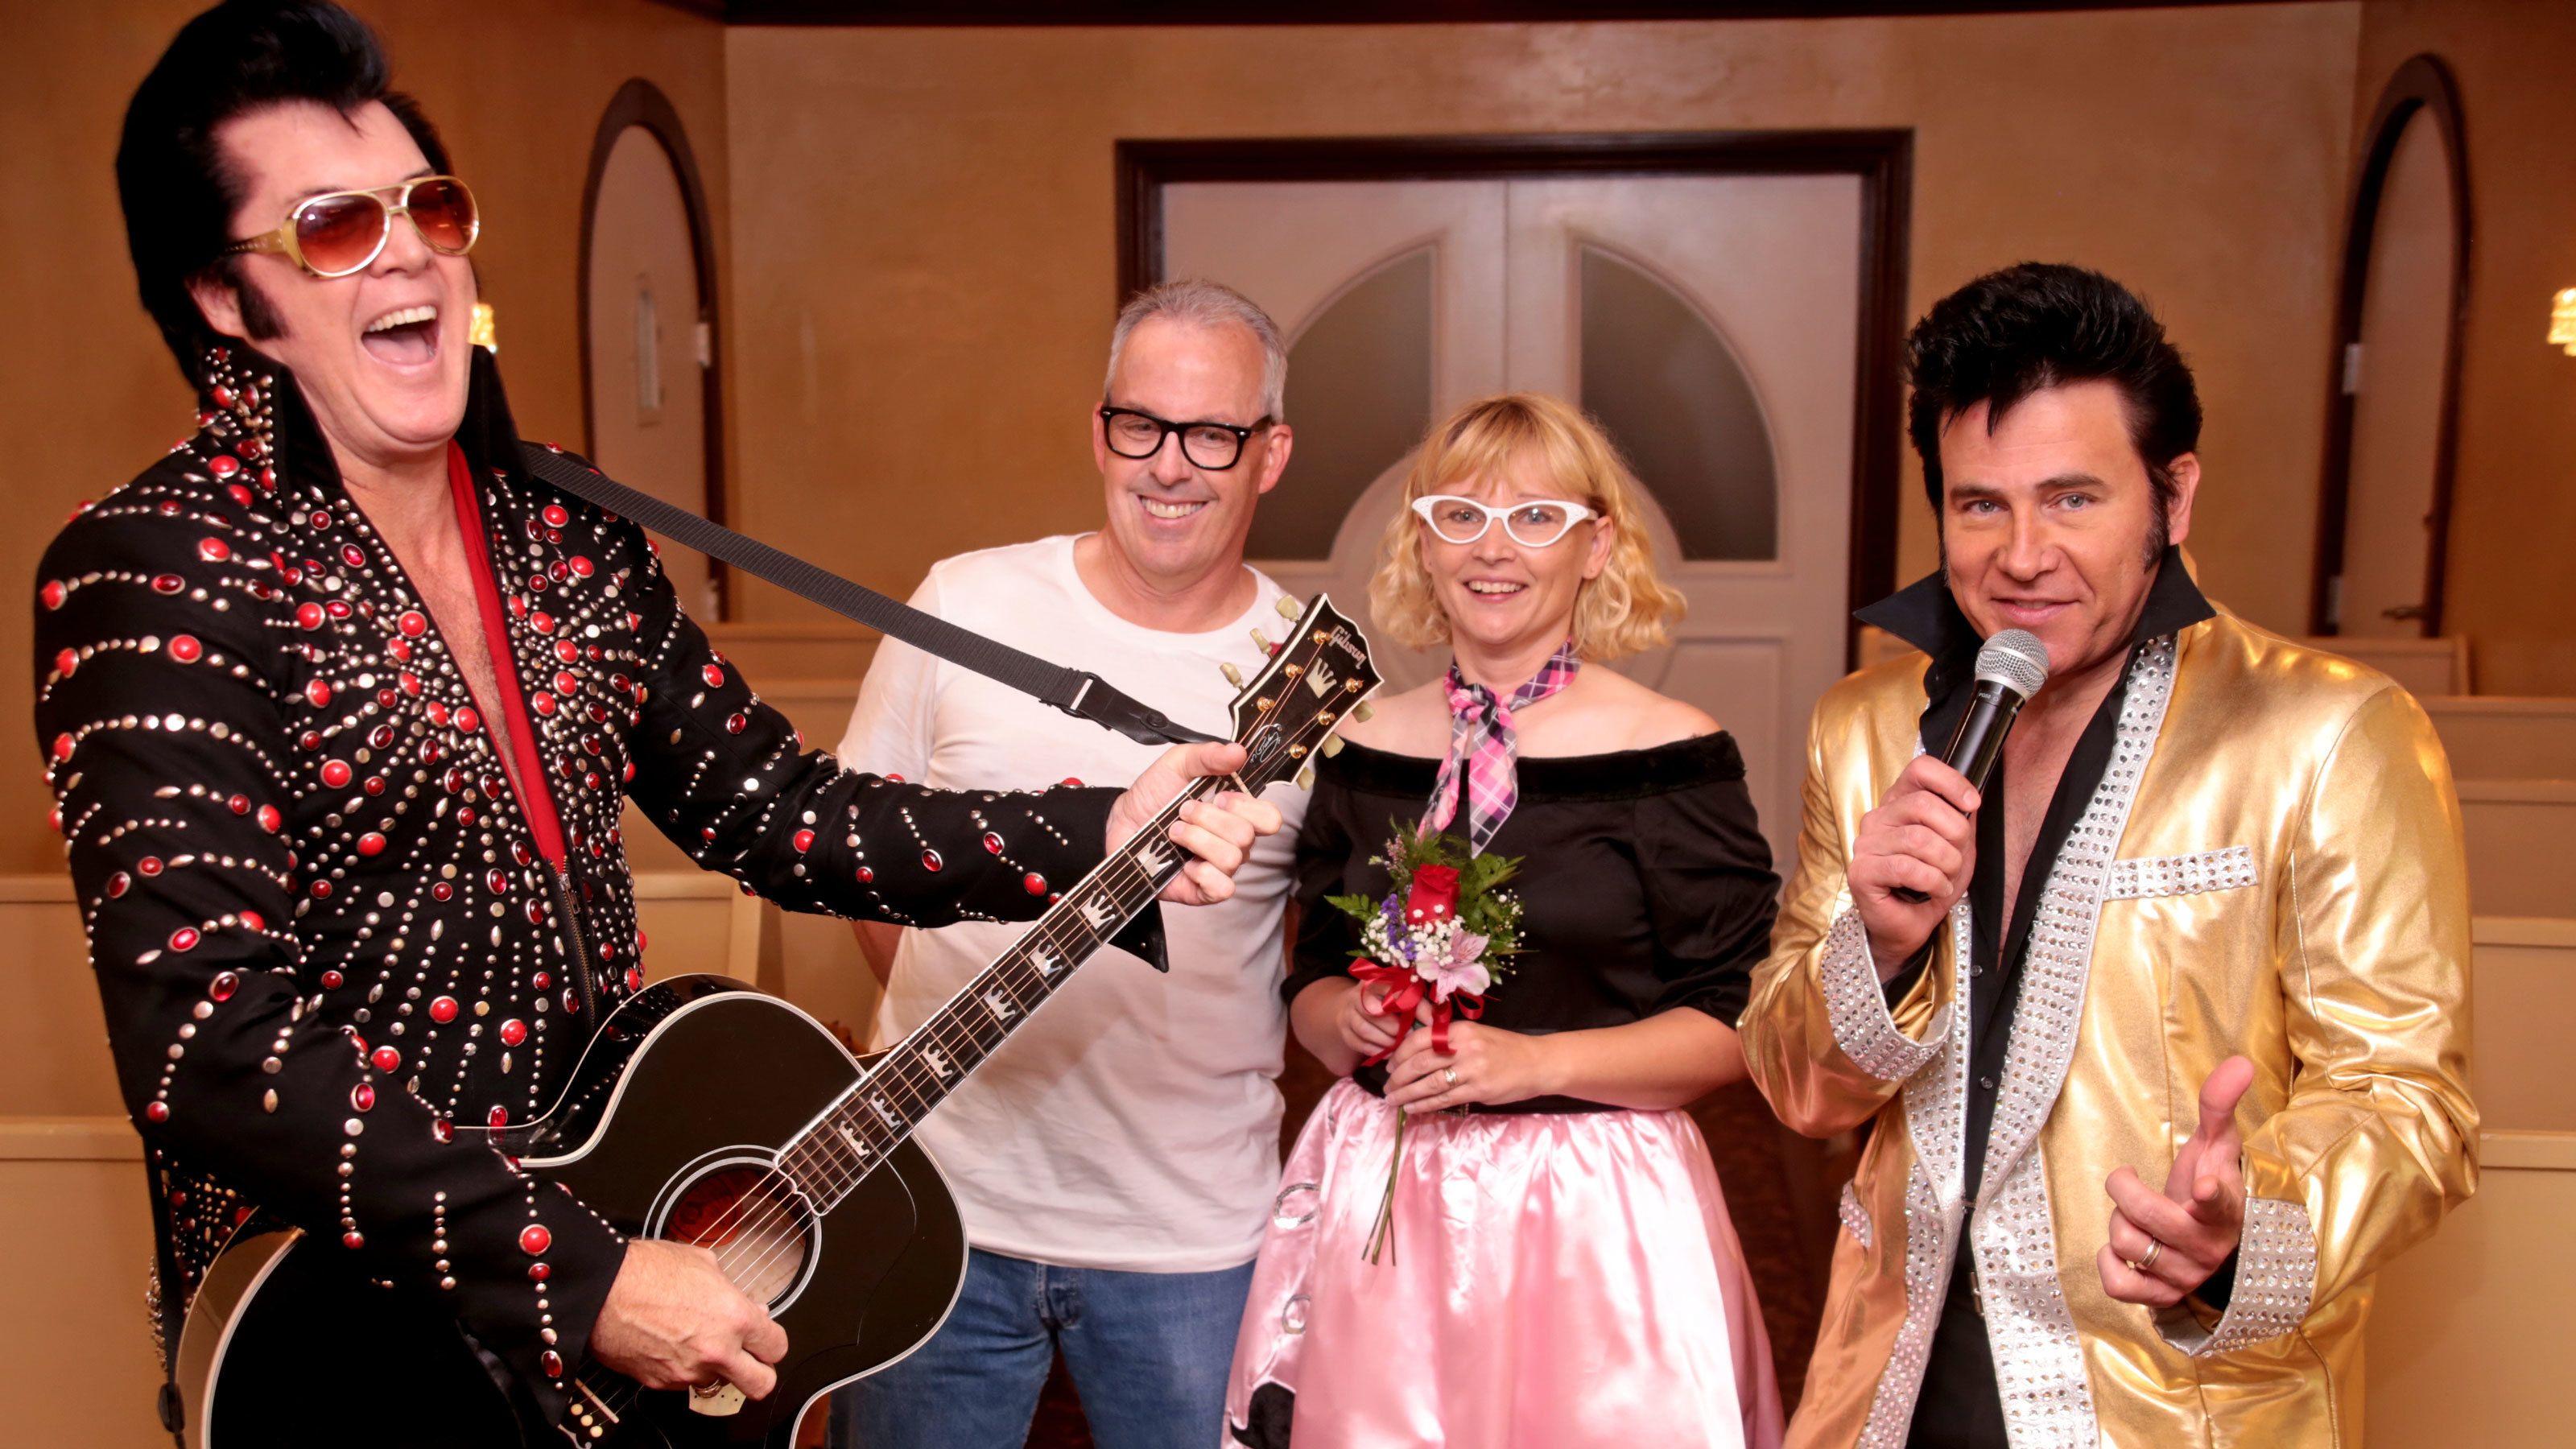 Dueling Elvis Wedding or Renewal at Graceland Wedding Chapel